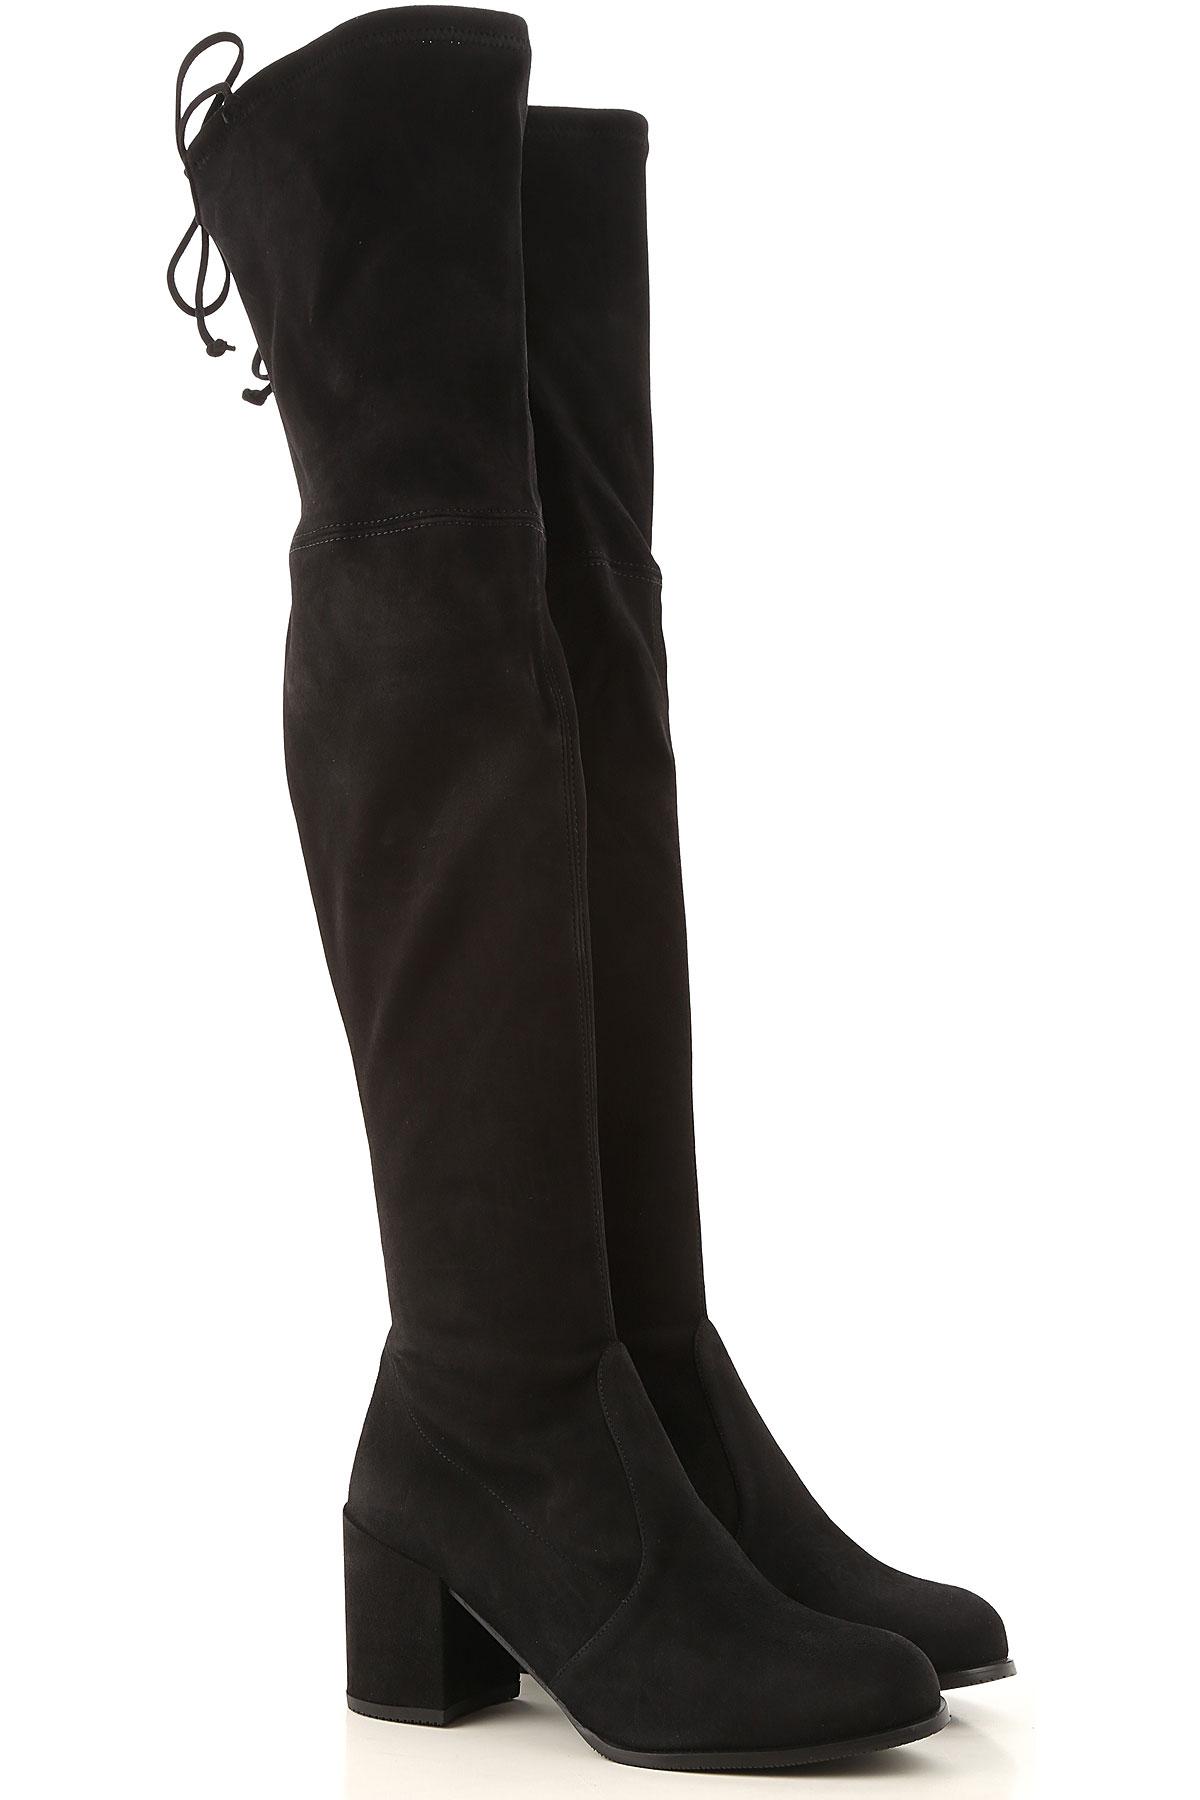 Stuart Weitzman Boots for Women, Booties On Sale, Black, Suede leather, 2019, US 4.5 ( EU 35) US 6.5 (EU 37) US 7.5 (EU 38) US 8.5 (EU 39)